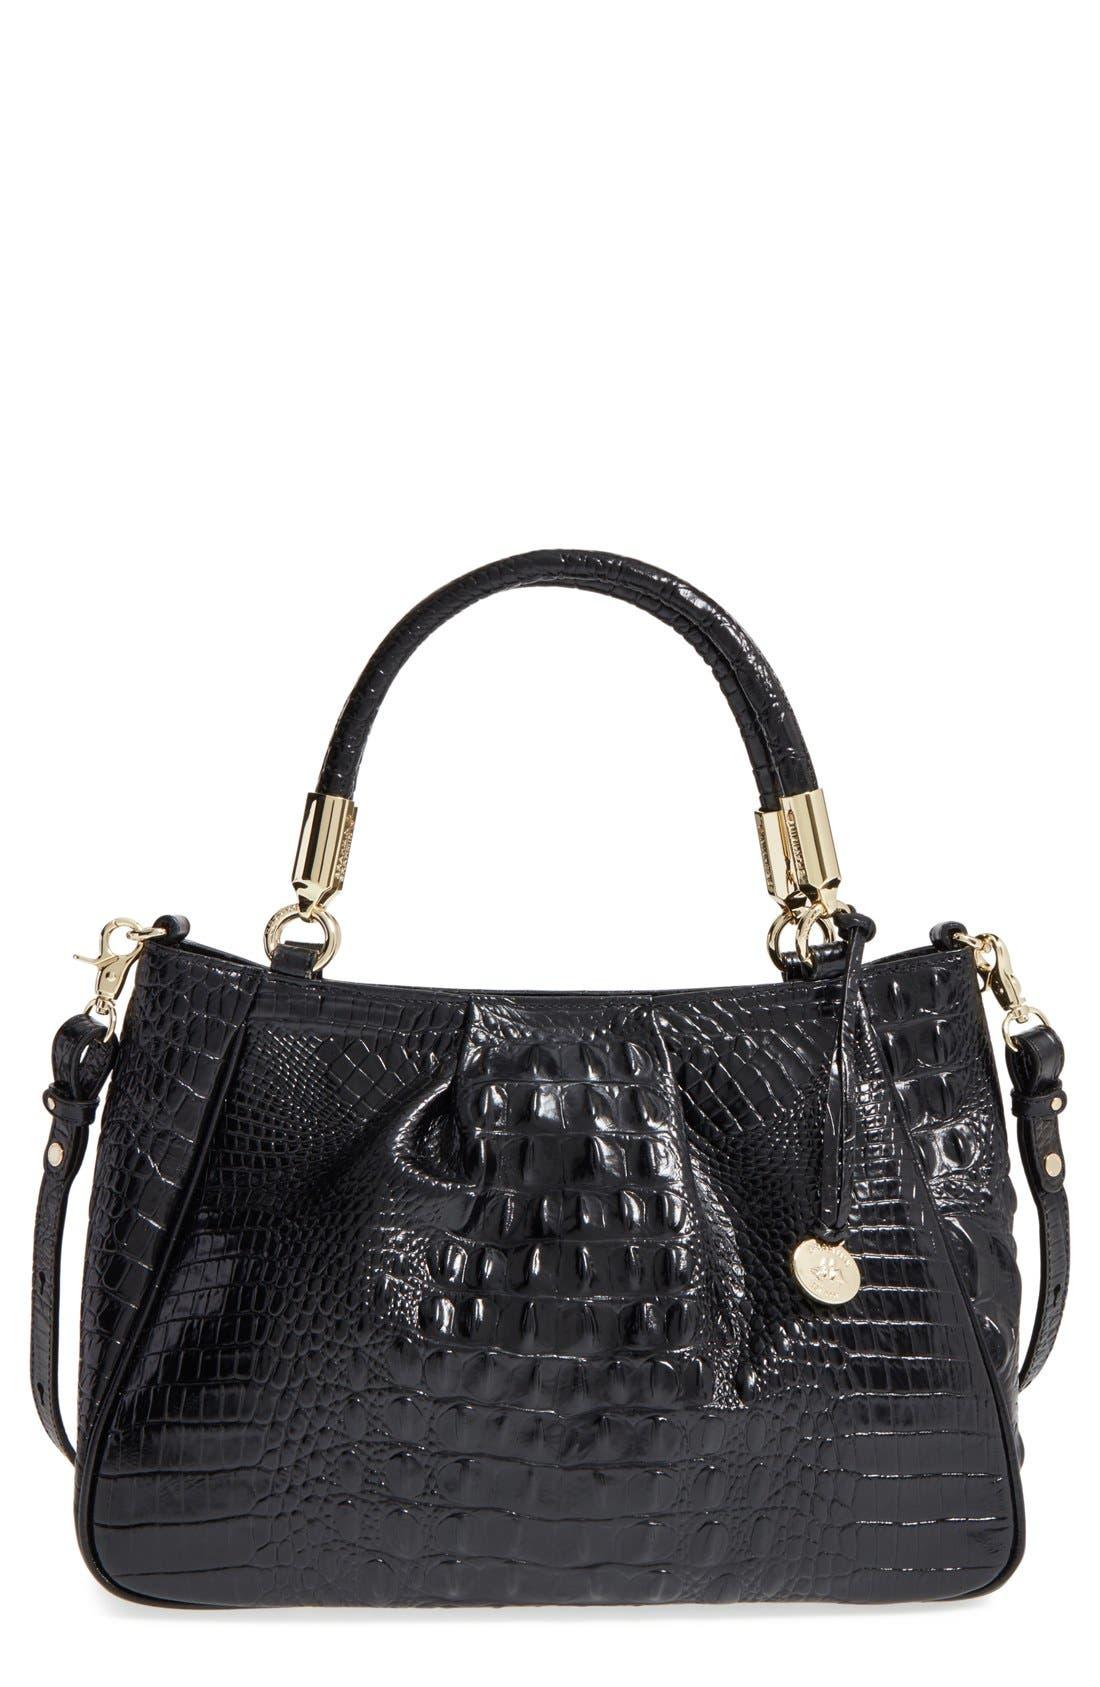 Main Image - Brahmin Ruby Croc Embossed Leather Satchel